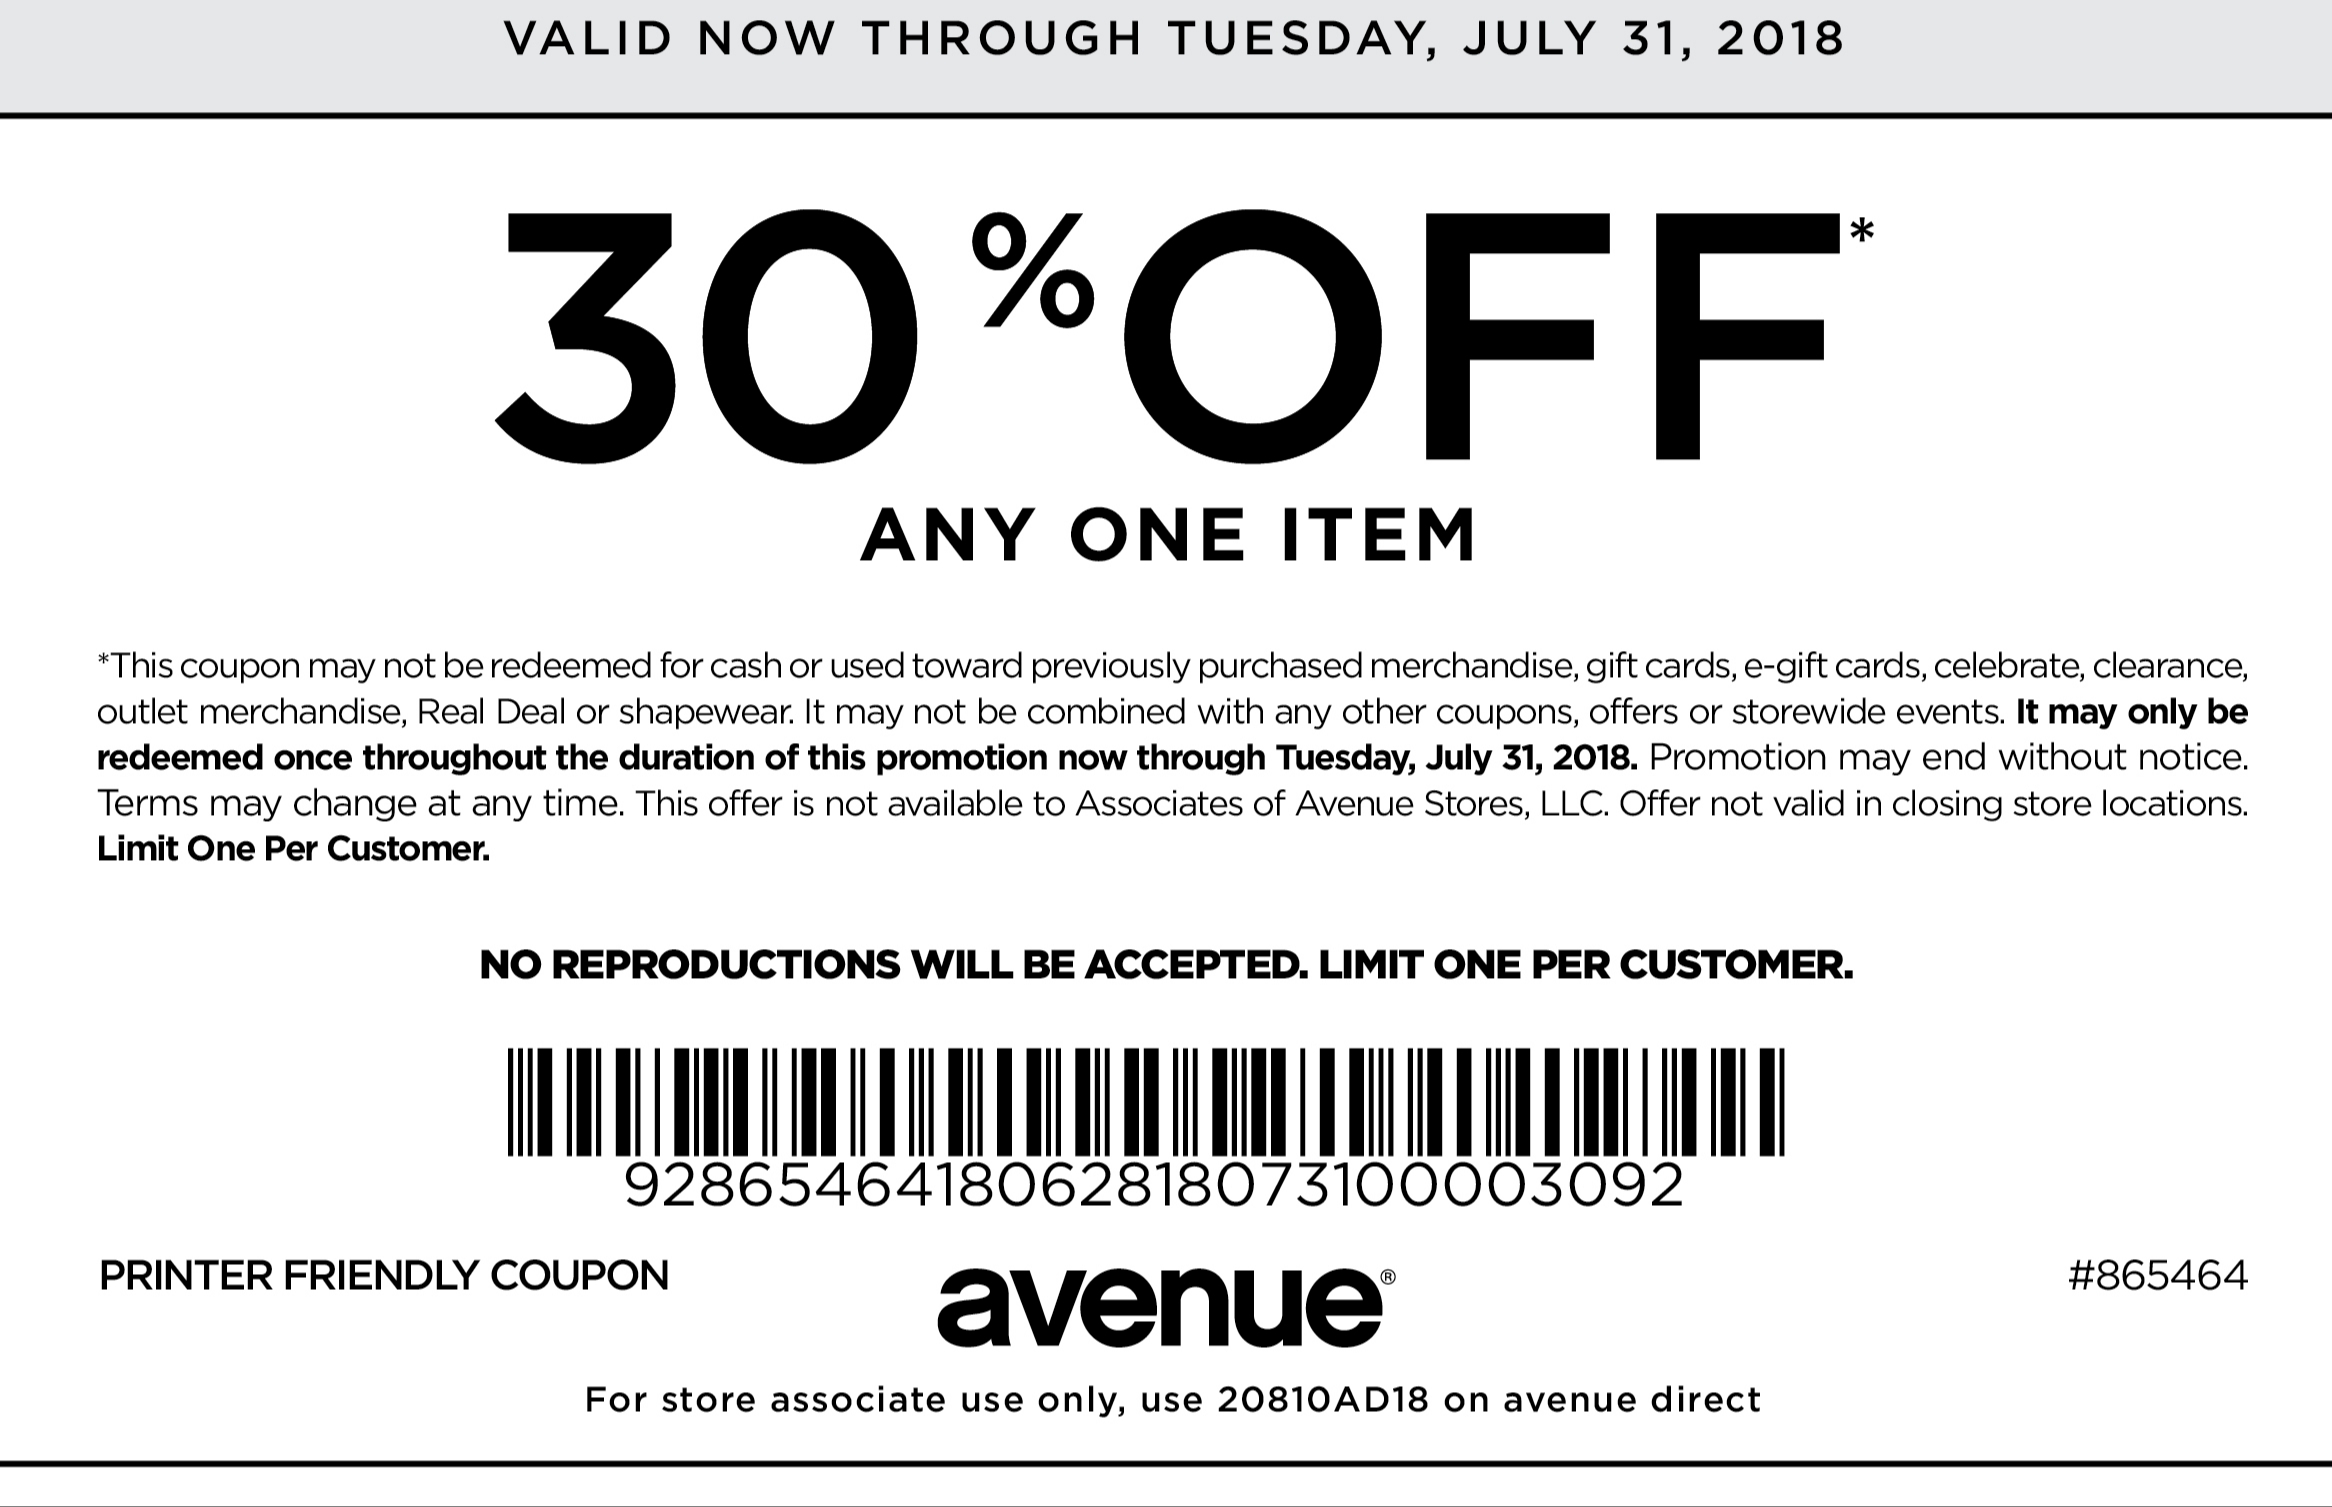 Avenue.com Promo Coupon 30% off a single item at Avenue